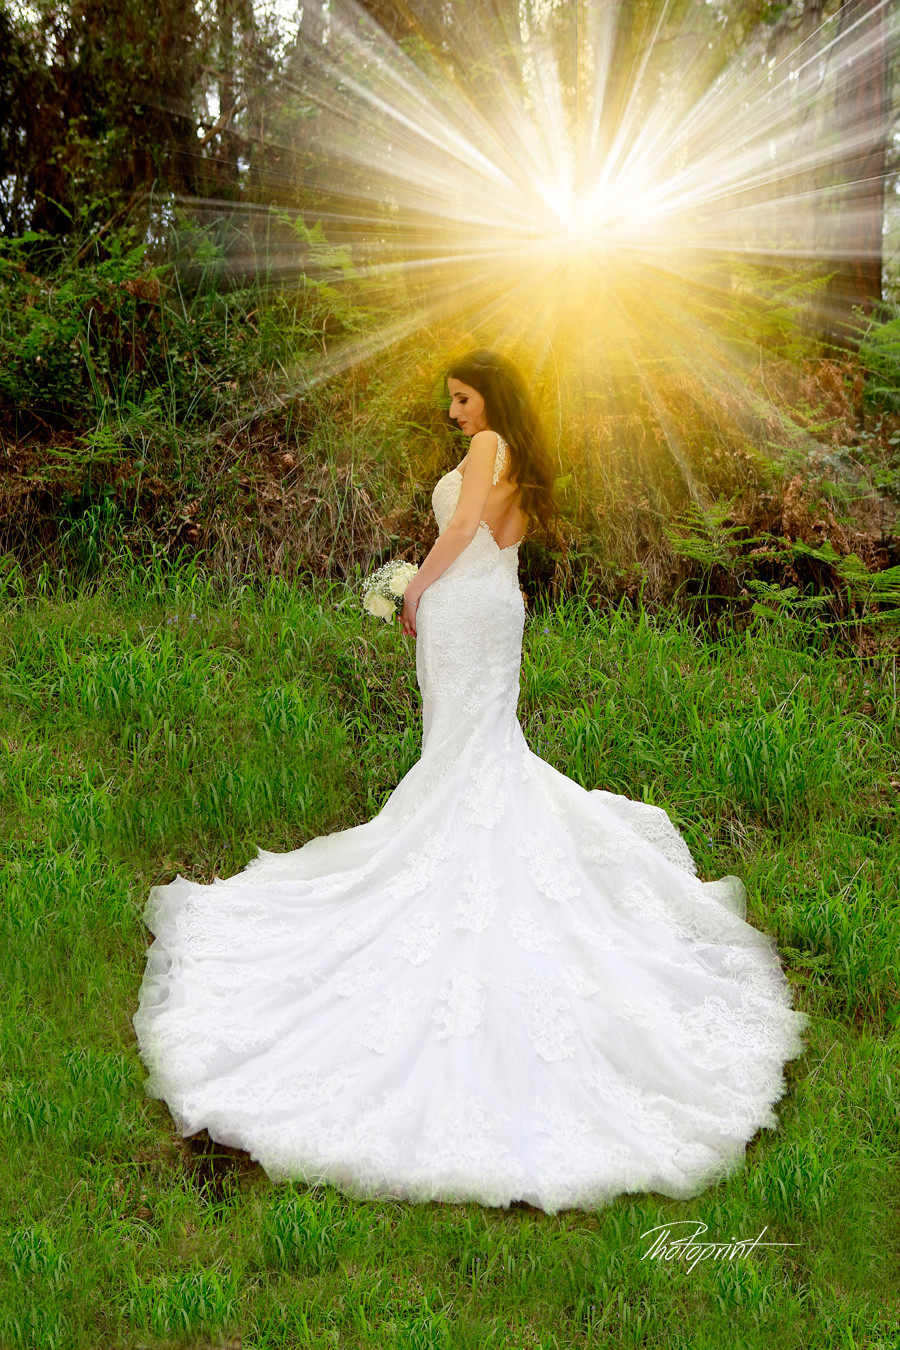 wedding photo best prices Larnaca cyprus